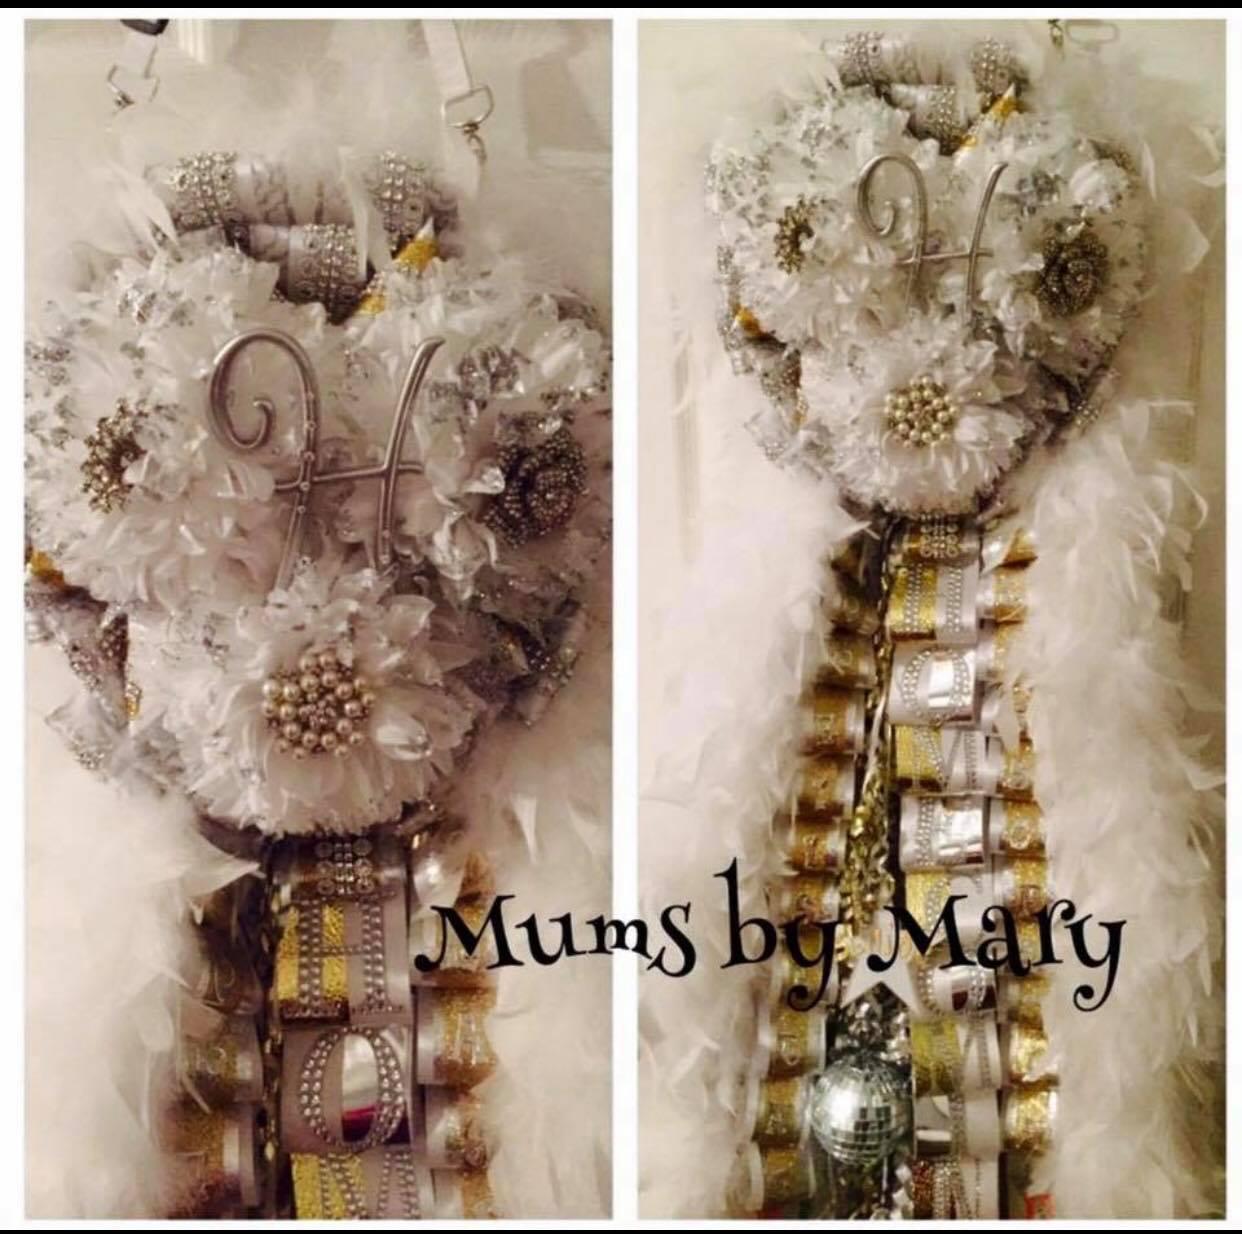 Mary's Mums